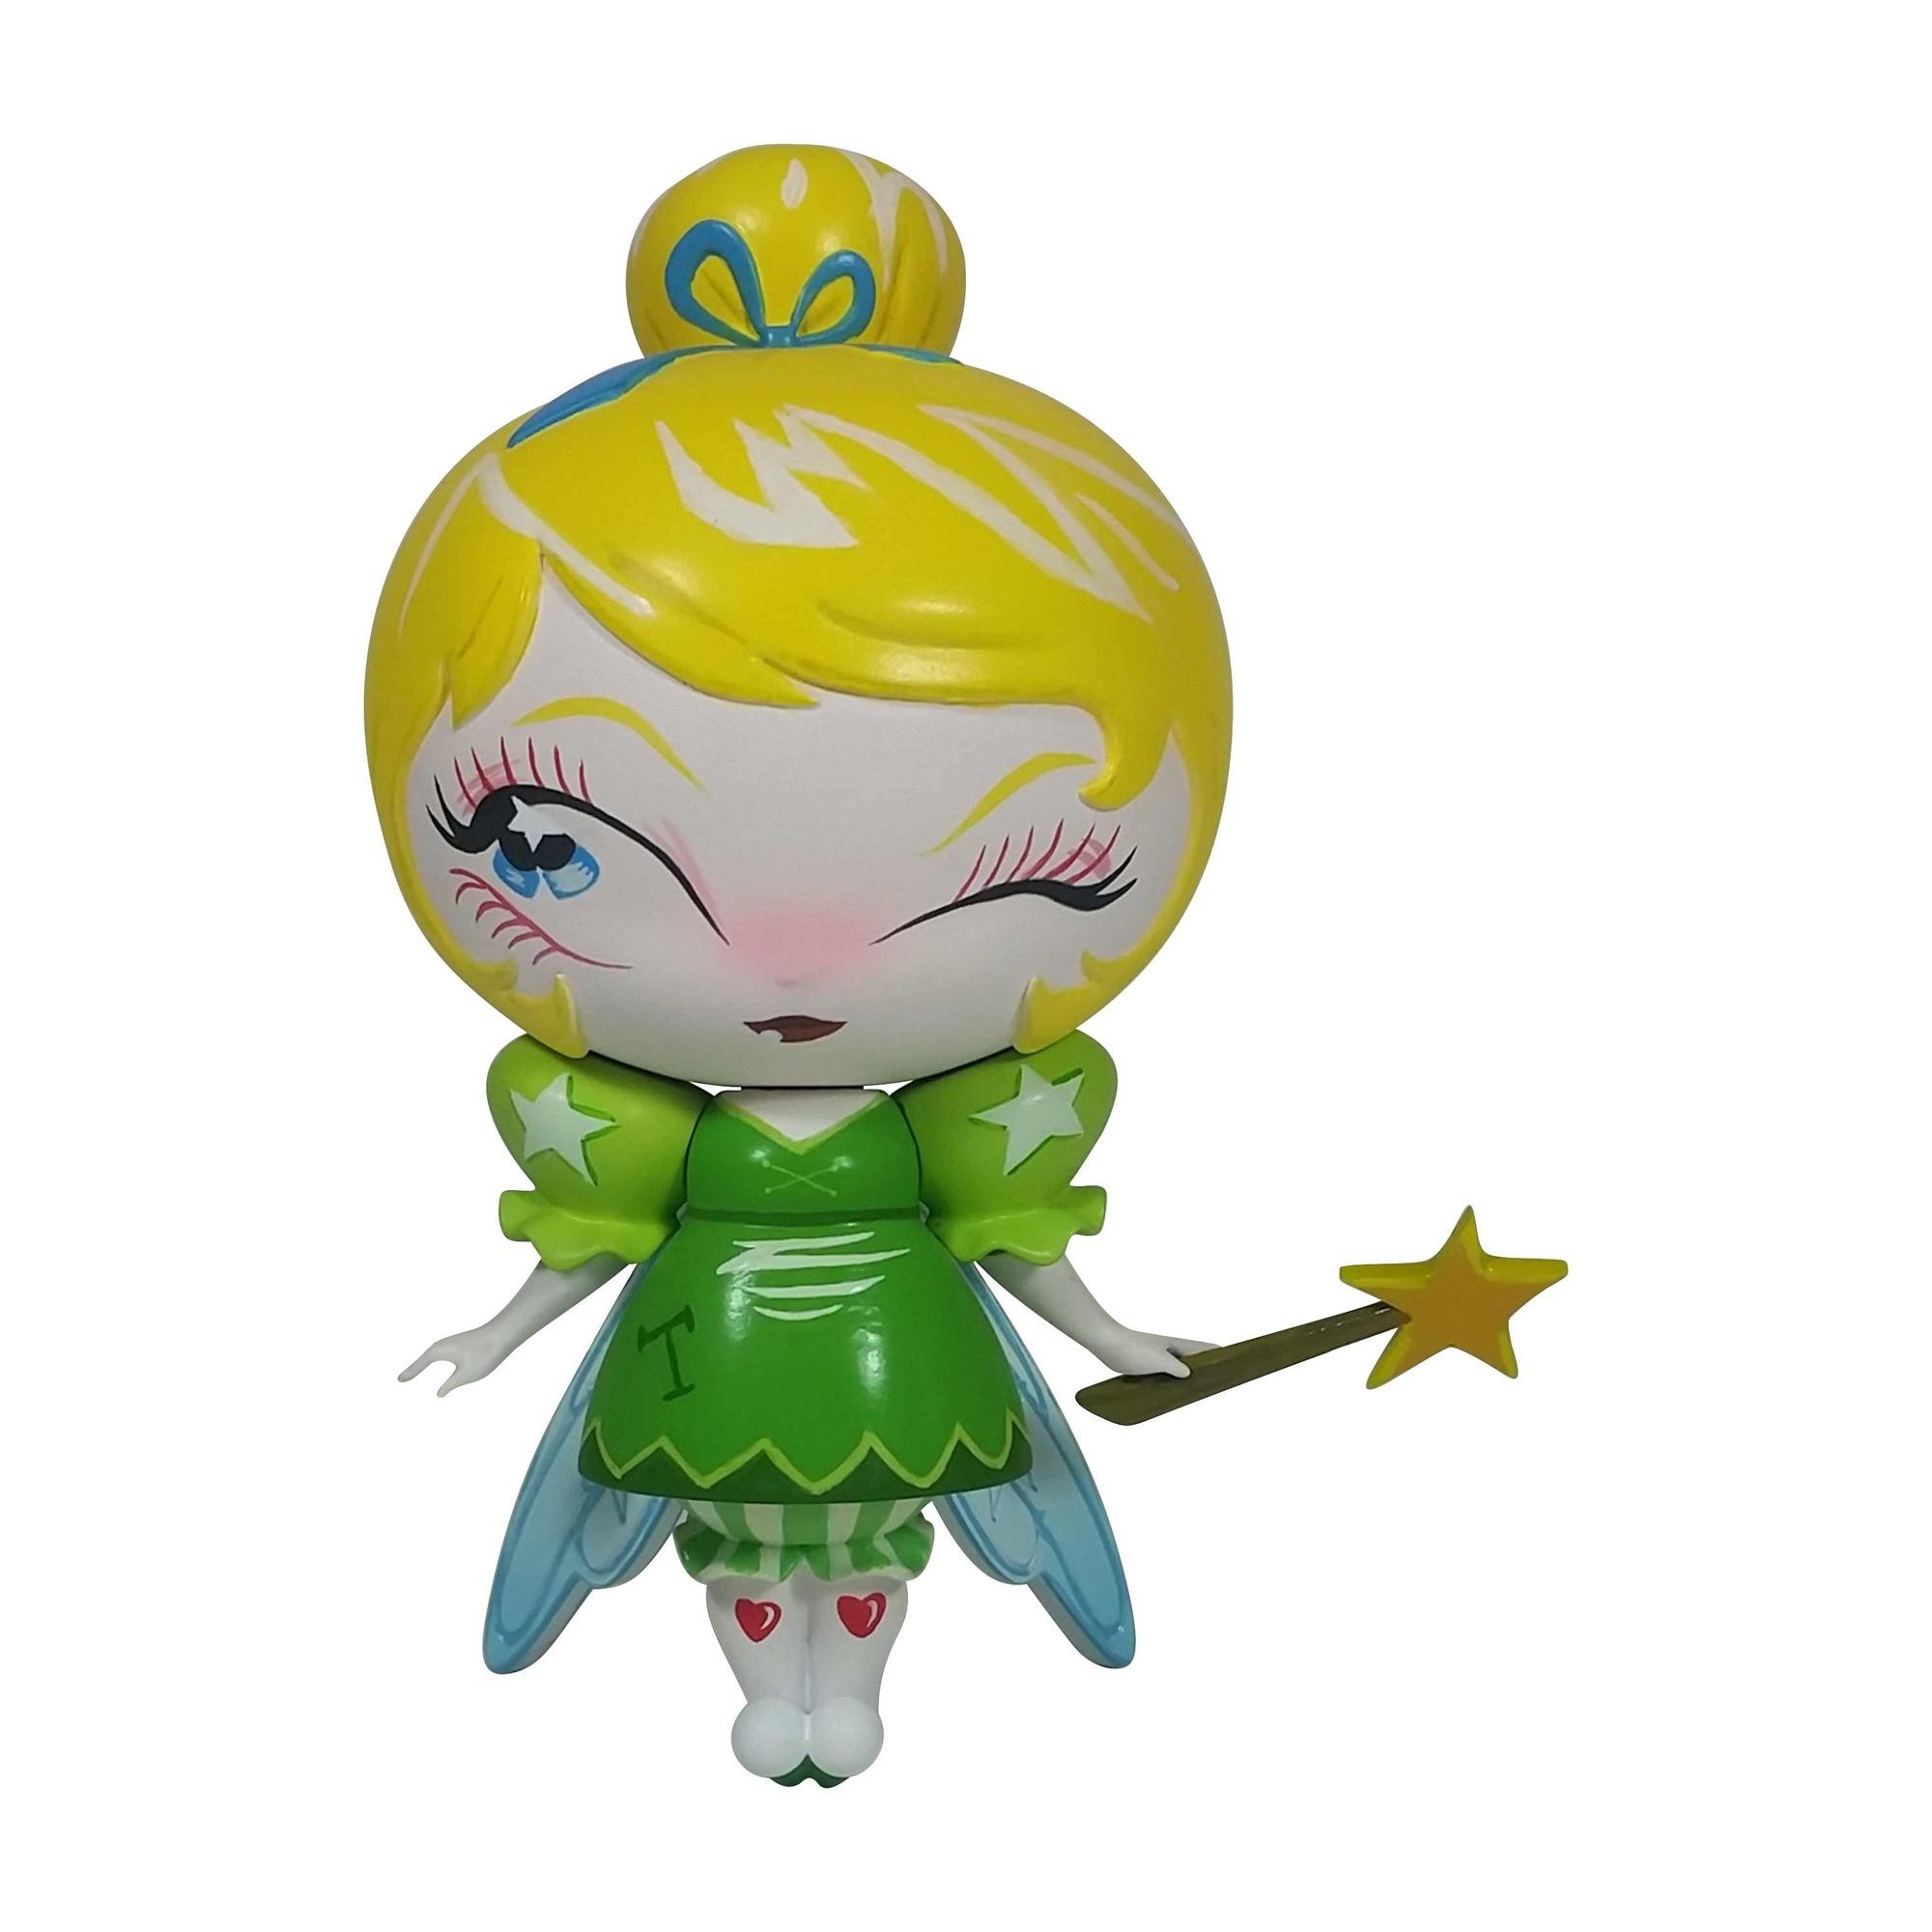 World of Miss Mindy 6001675N Vinyl - Tinker Bell